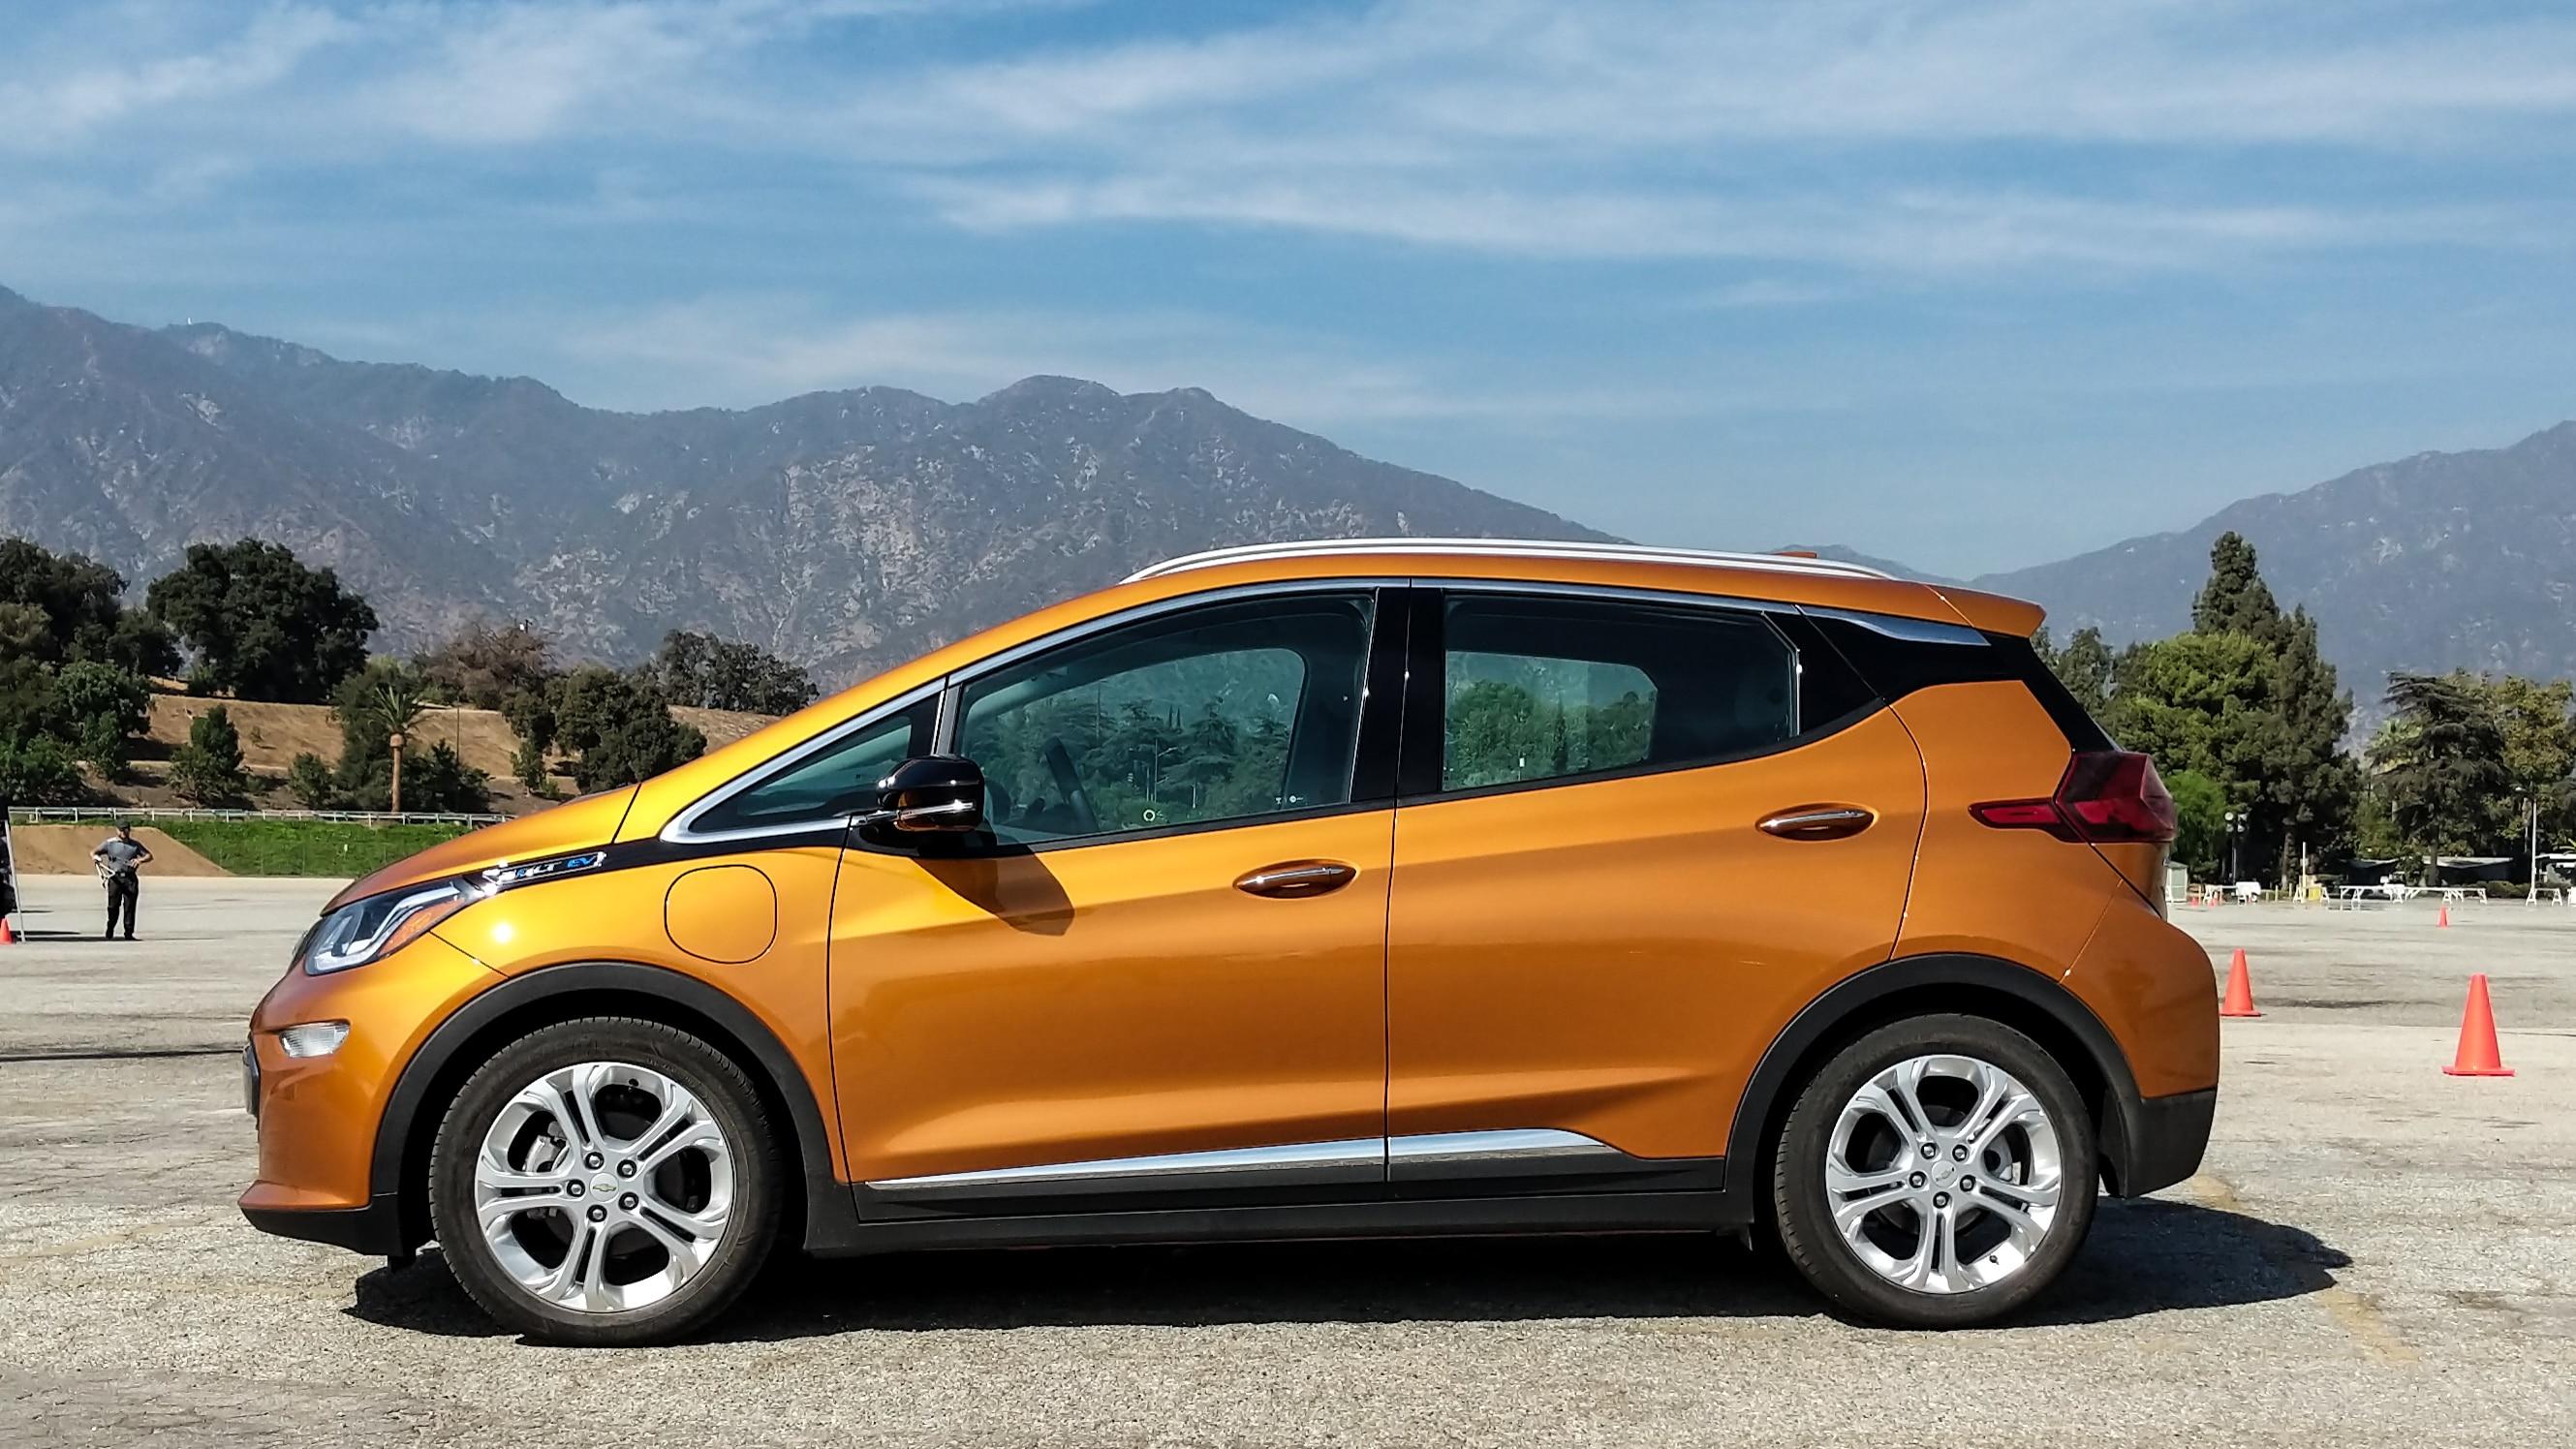 Autocrossing the 2019 Chevrolet Bolt EV   Automobile Magazine